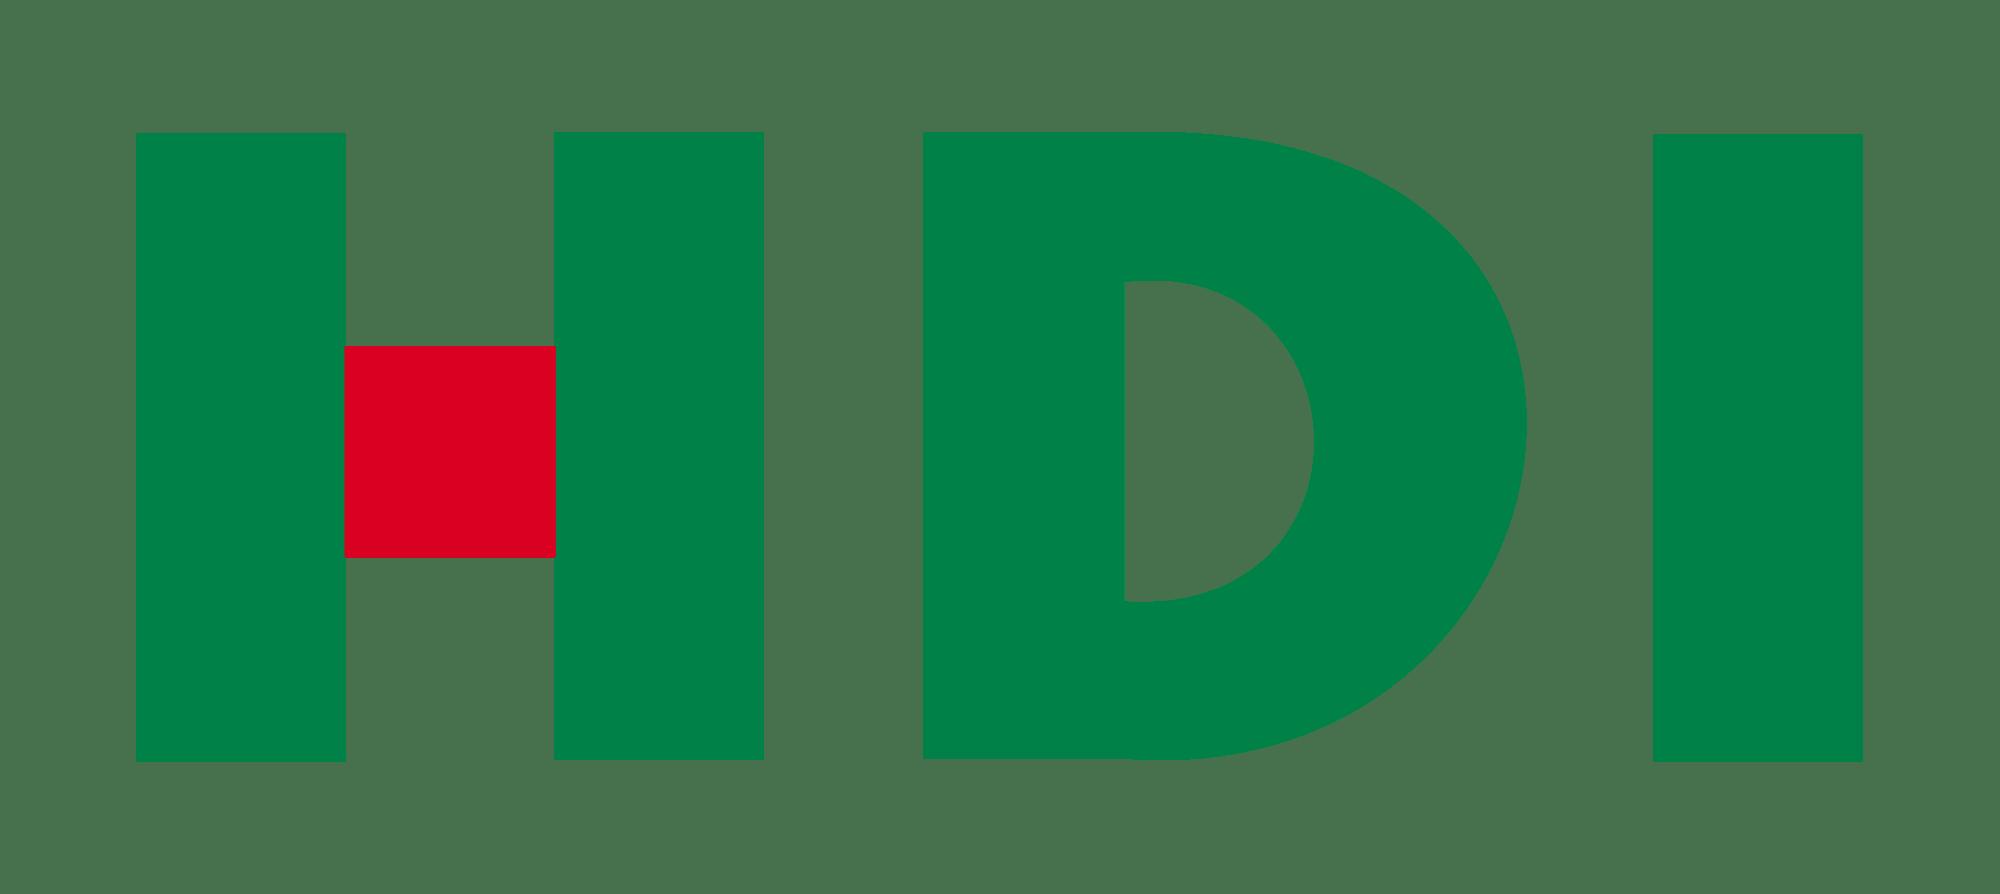 HDI Hausratversicherung